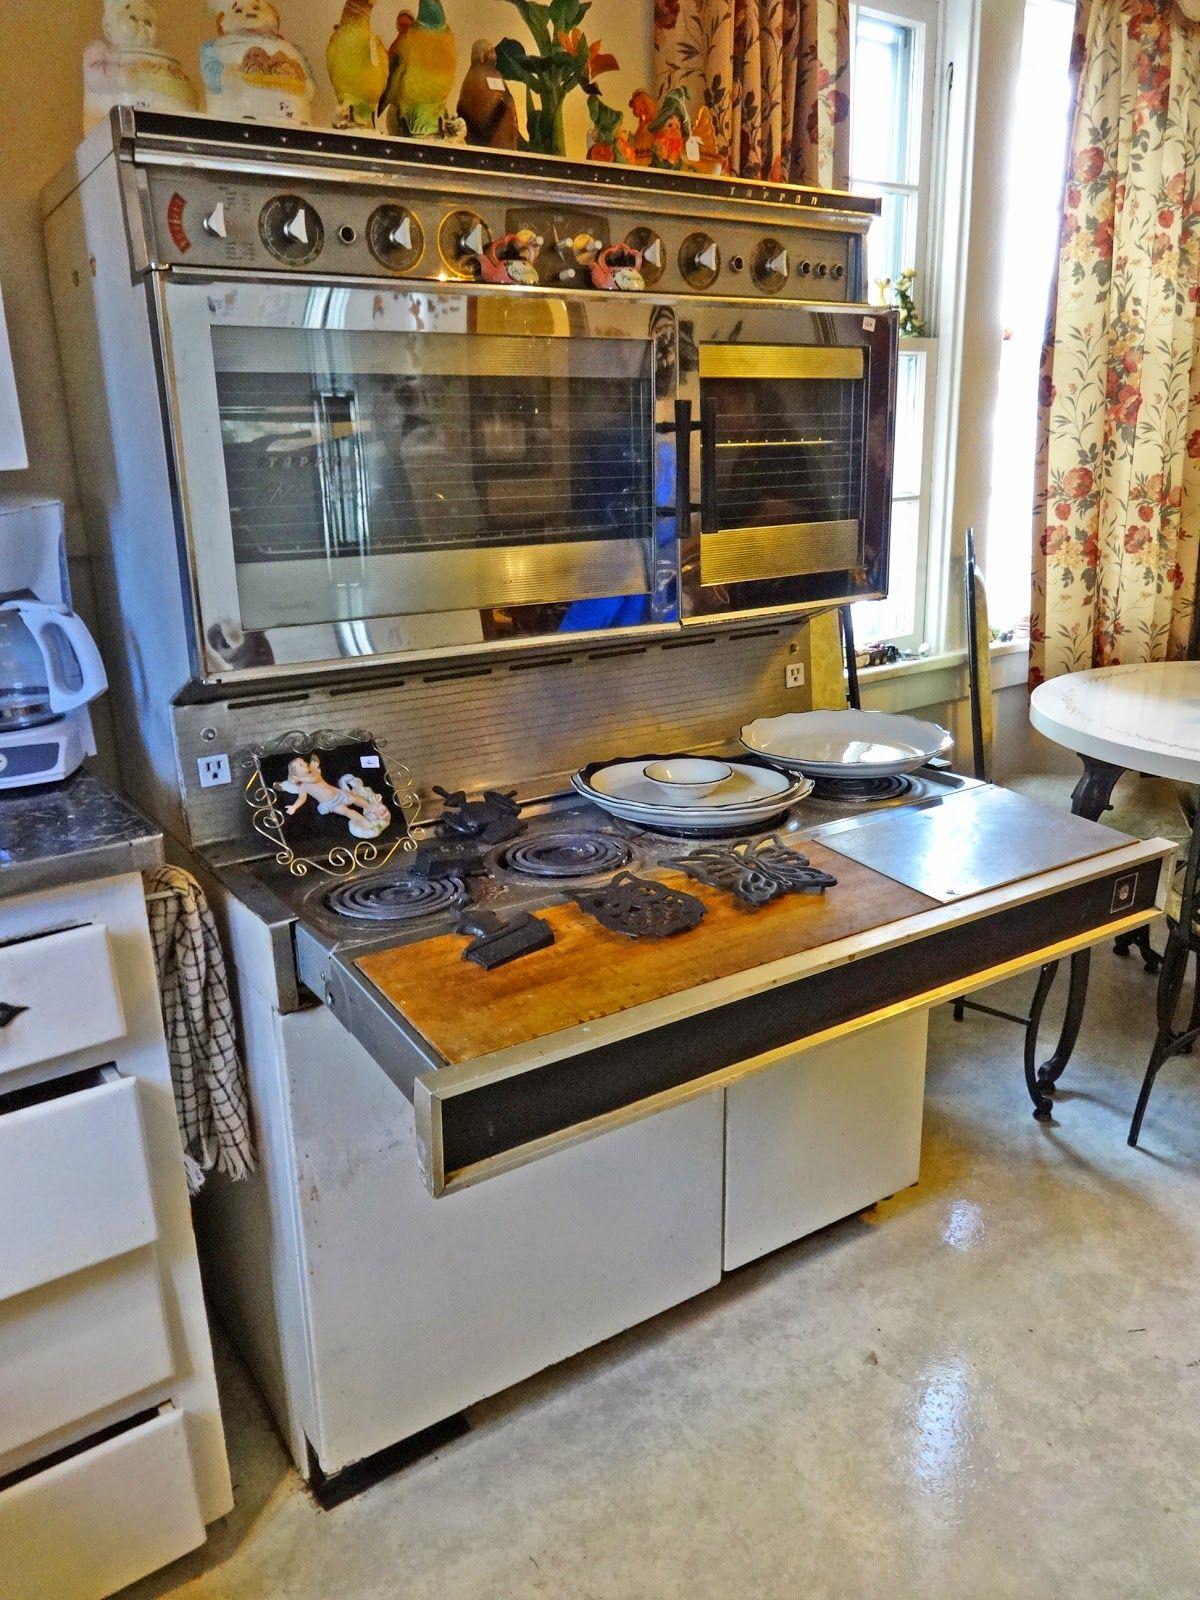 Tappan 400 Stove 1960s Tappan 400 Stove Ovens And